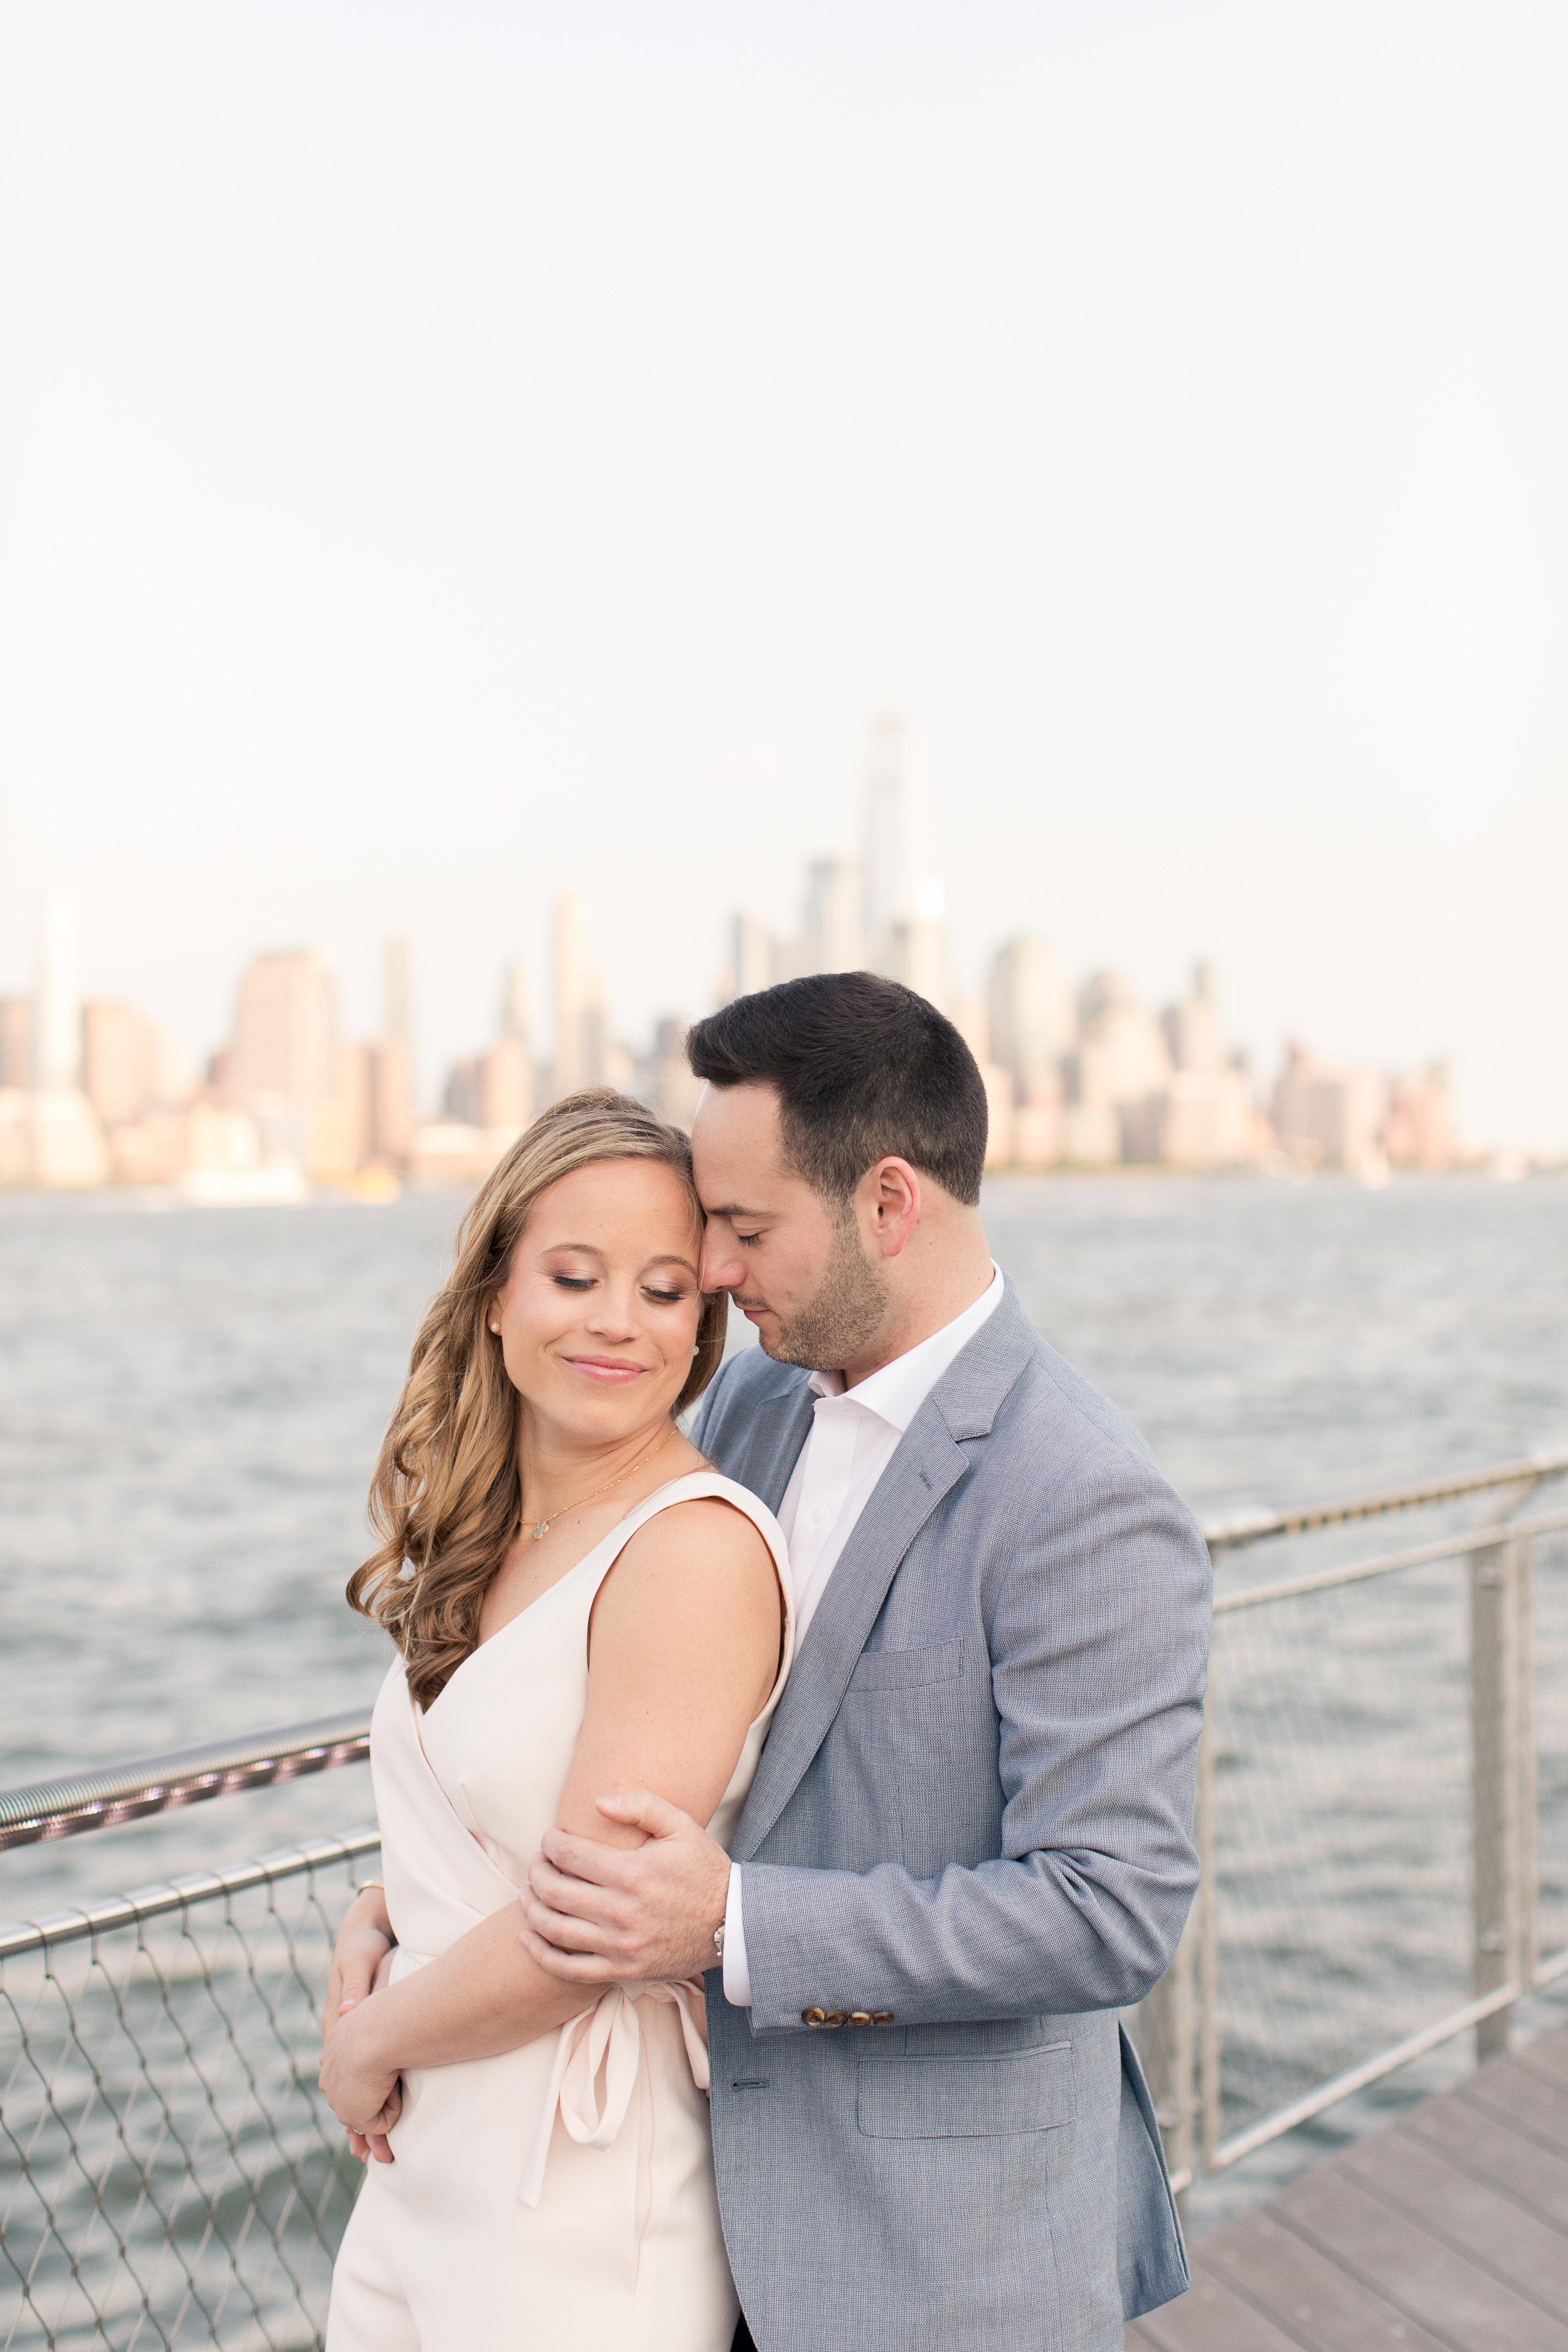 Ultimate Engagement Giveaway - Alyssa & Al - 11